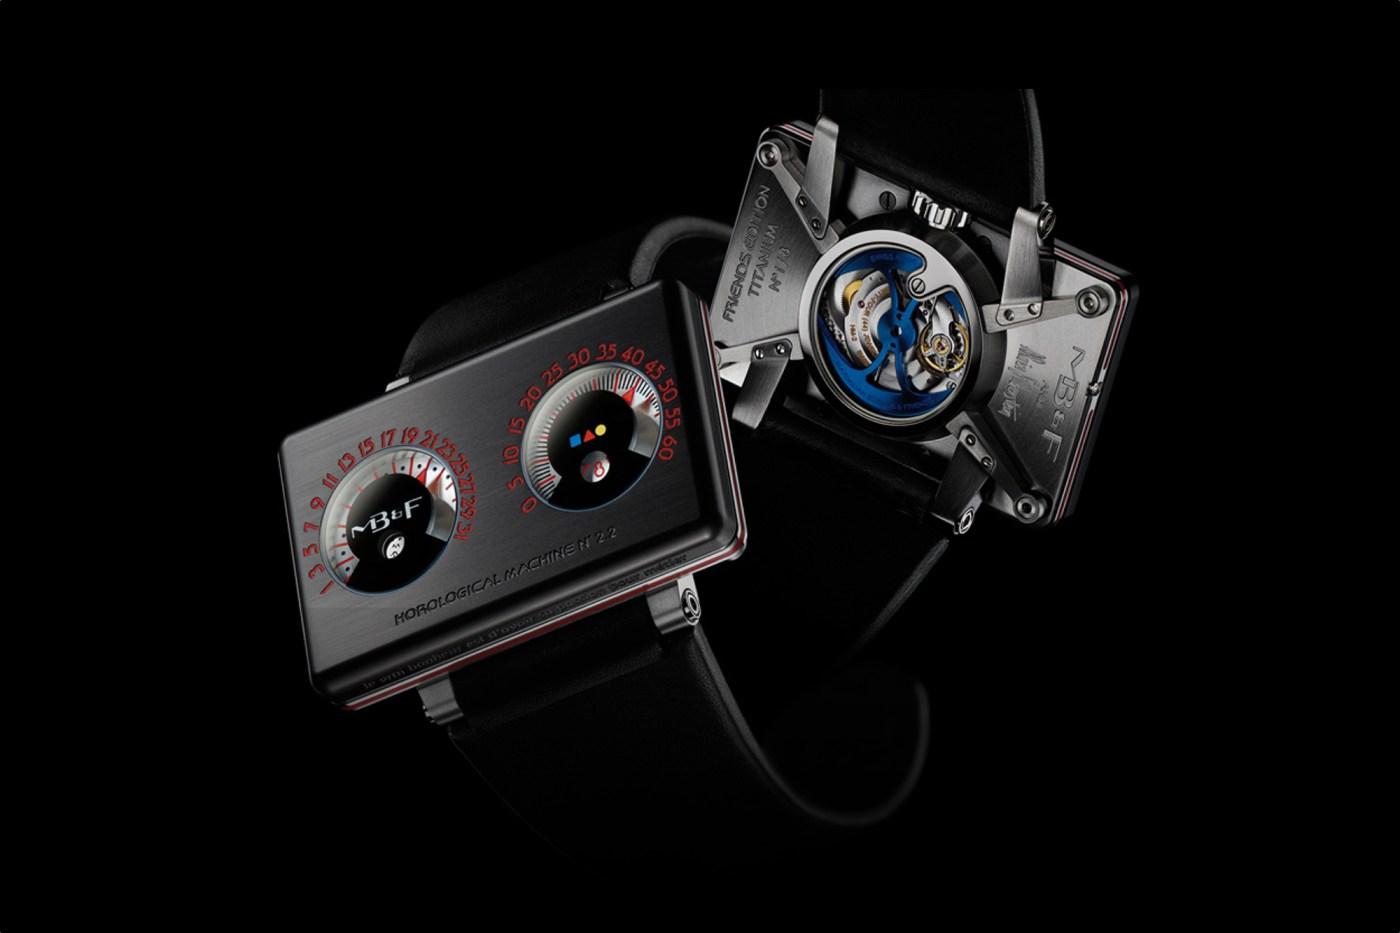 MB&F HM2.2 Black Box by Alain Silberstein